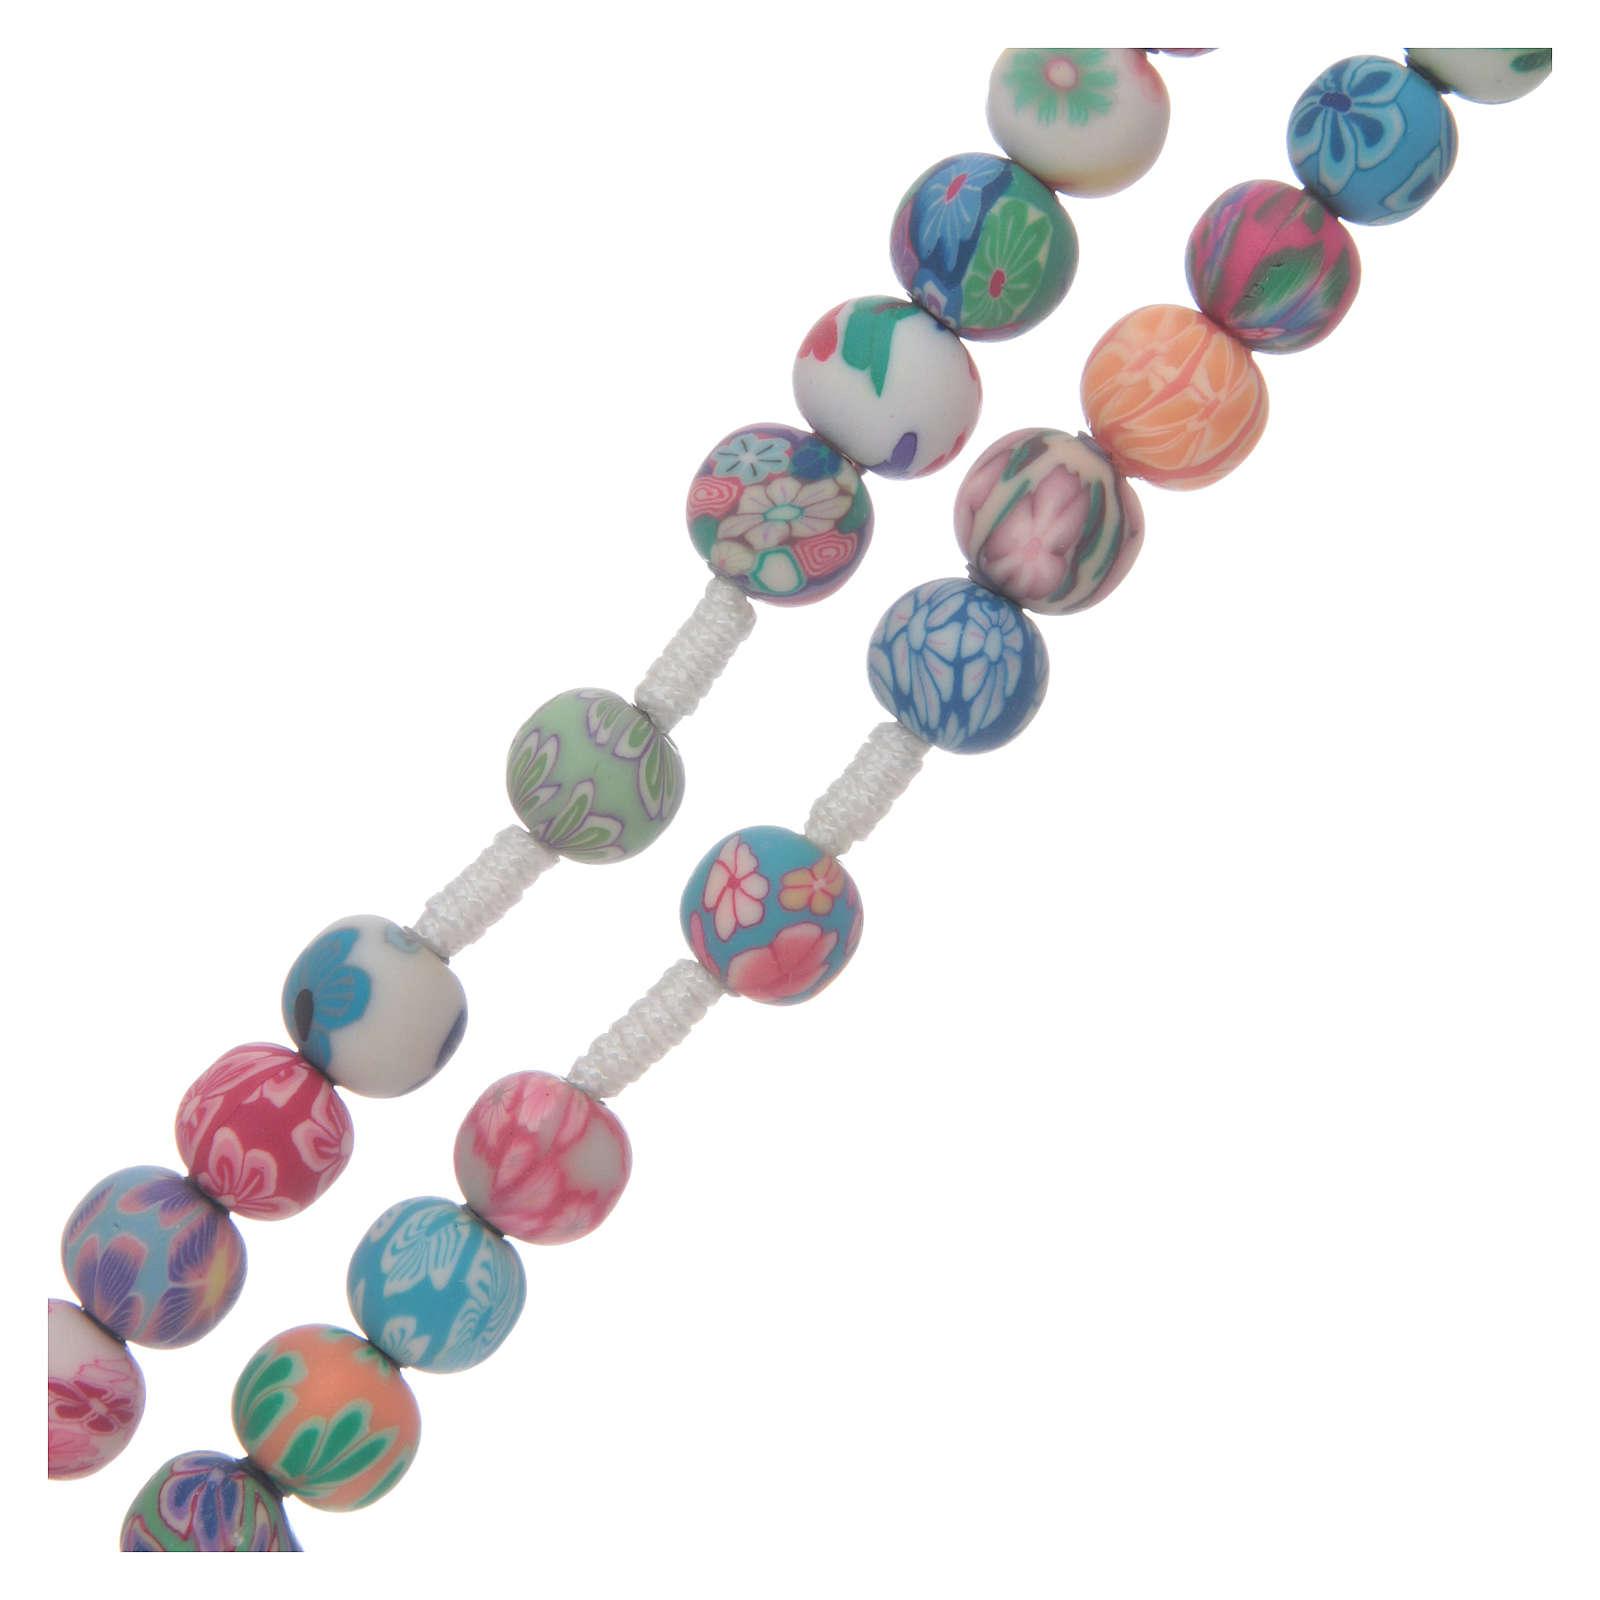 Chapelet Medjugorje fimo multicolore 4